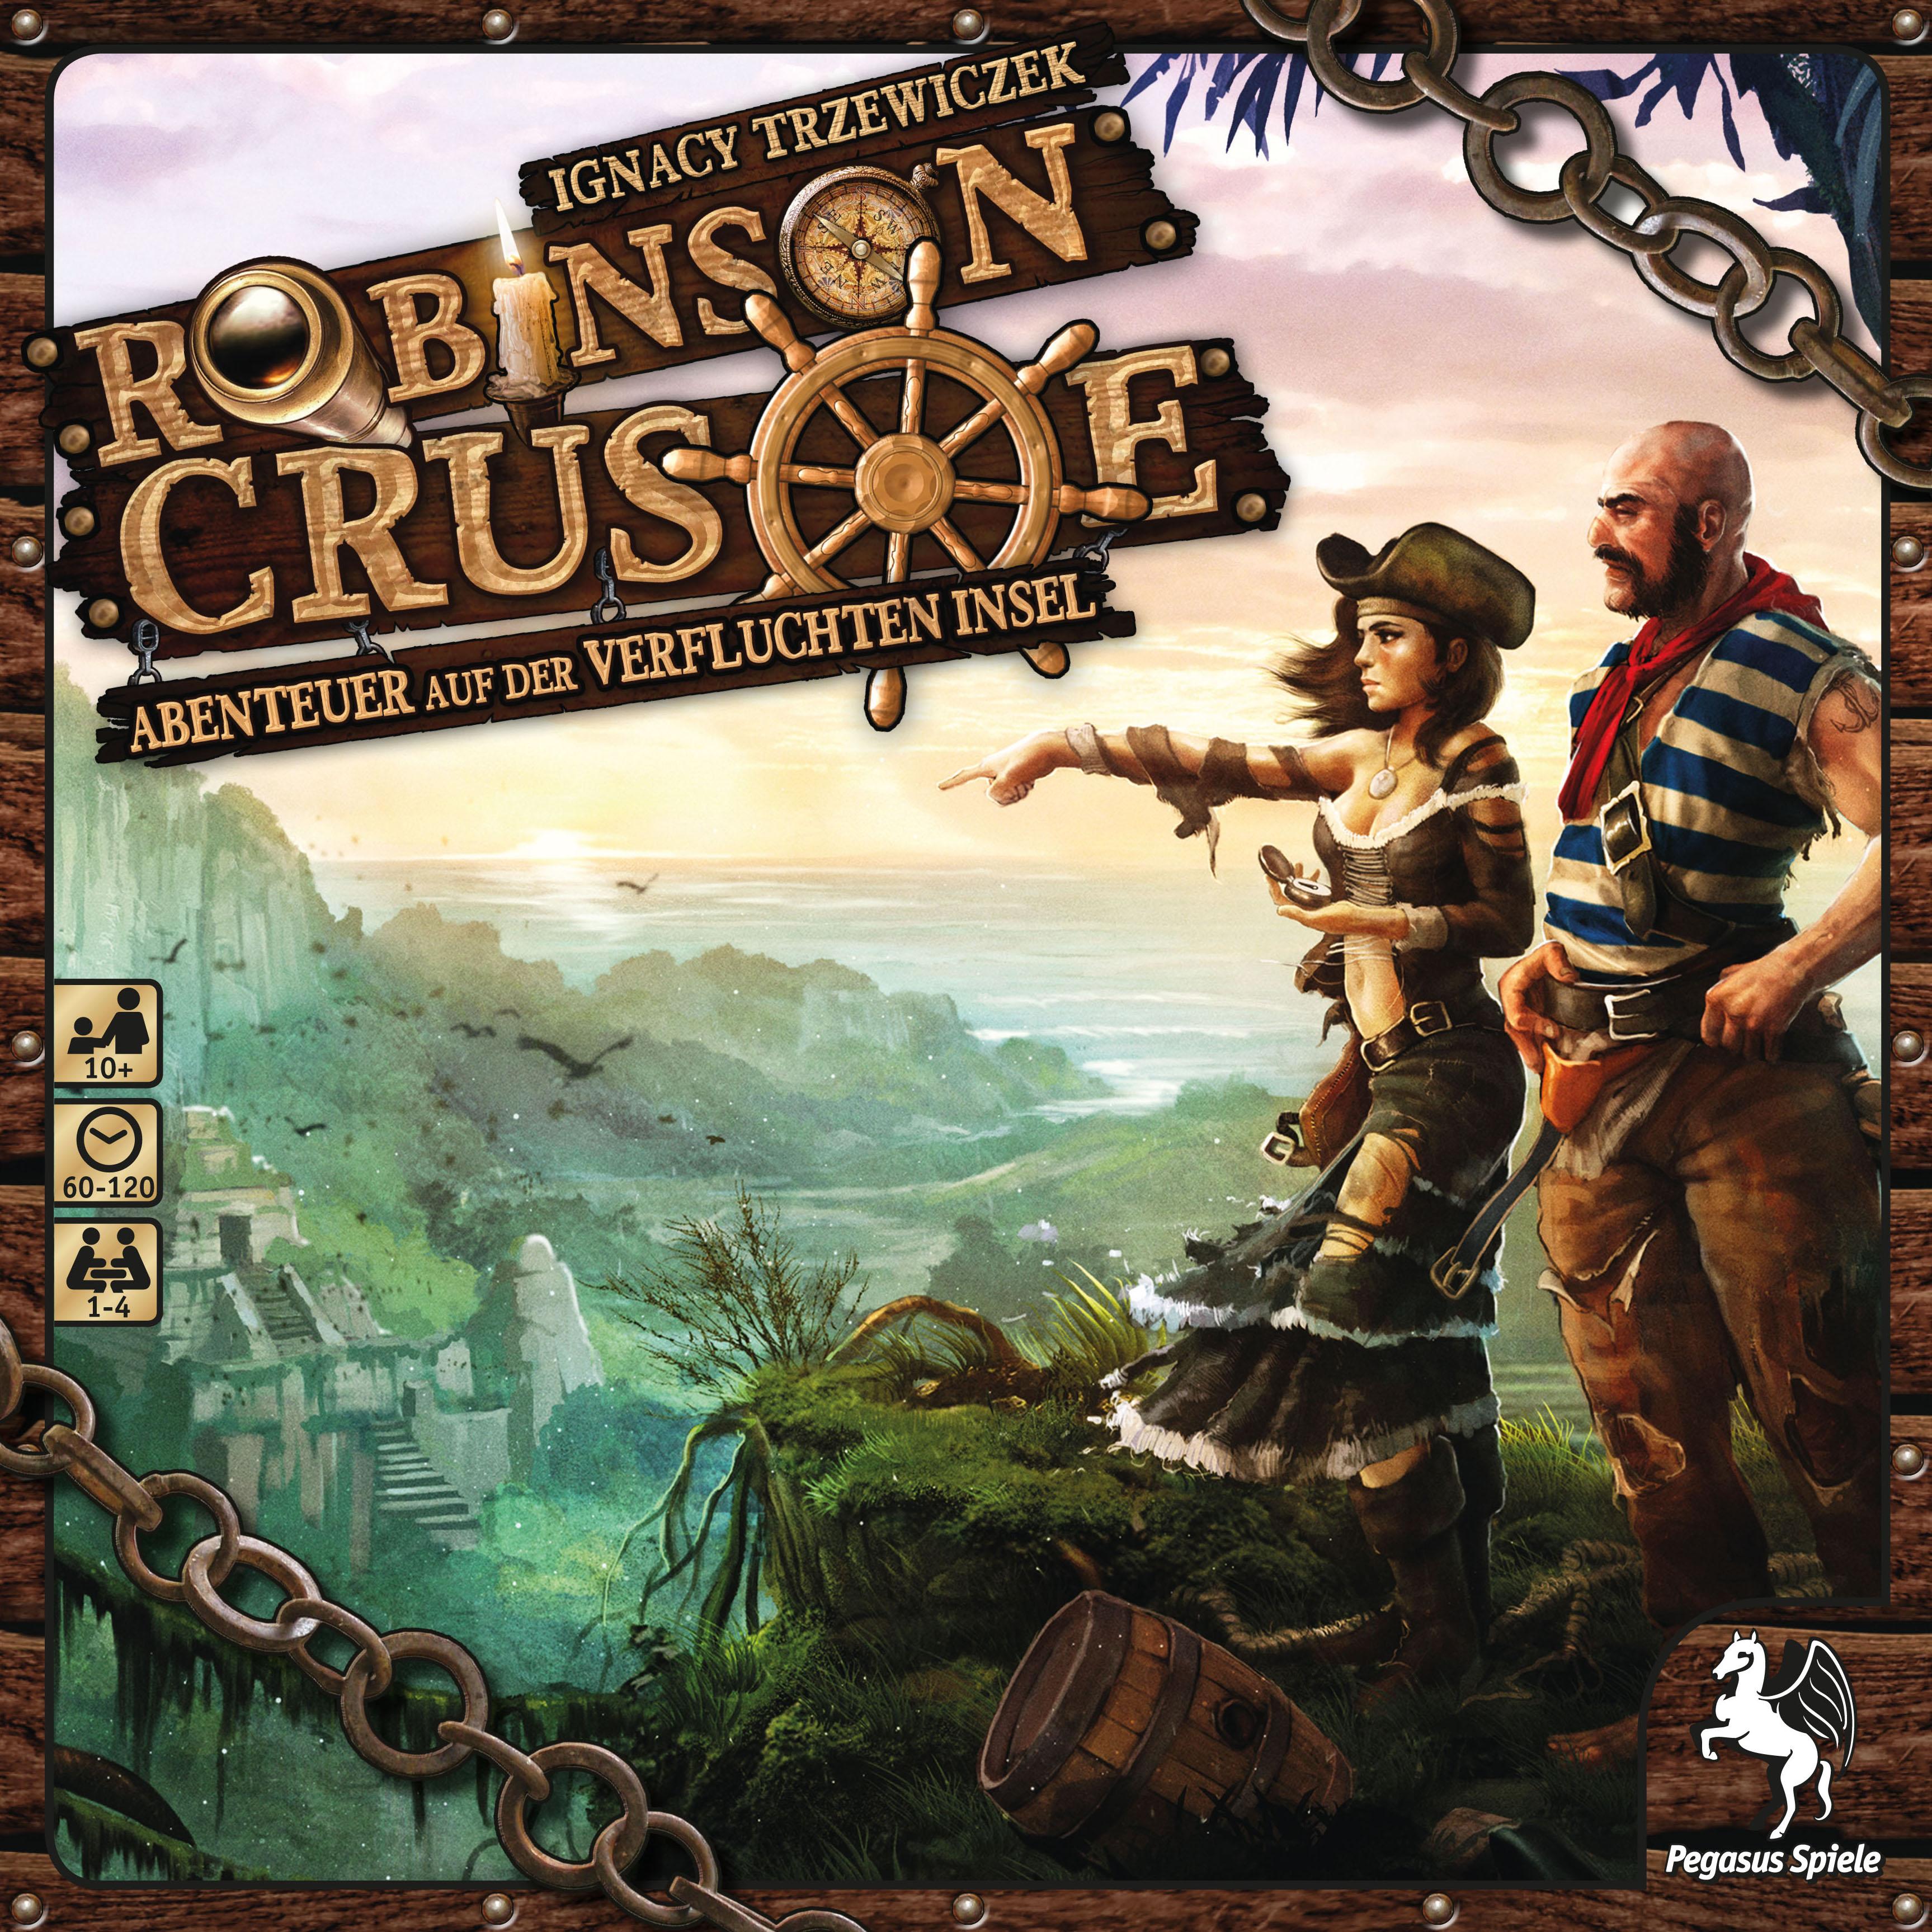 Robinson Crusoe Brettspiel Anleitung